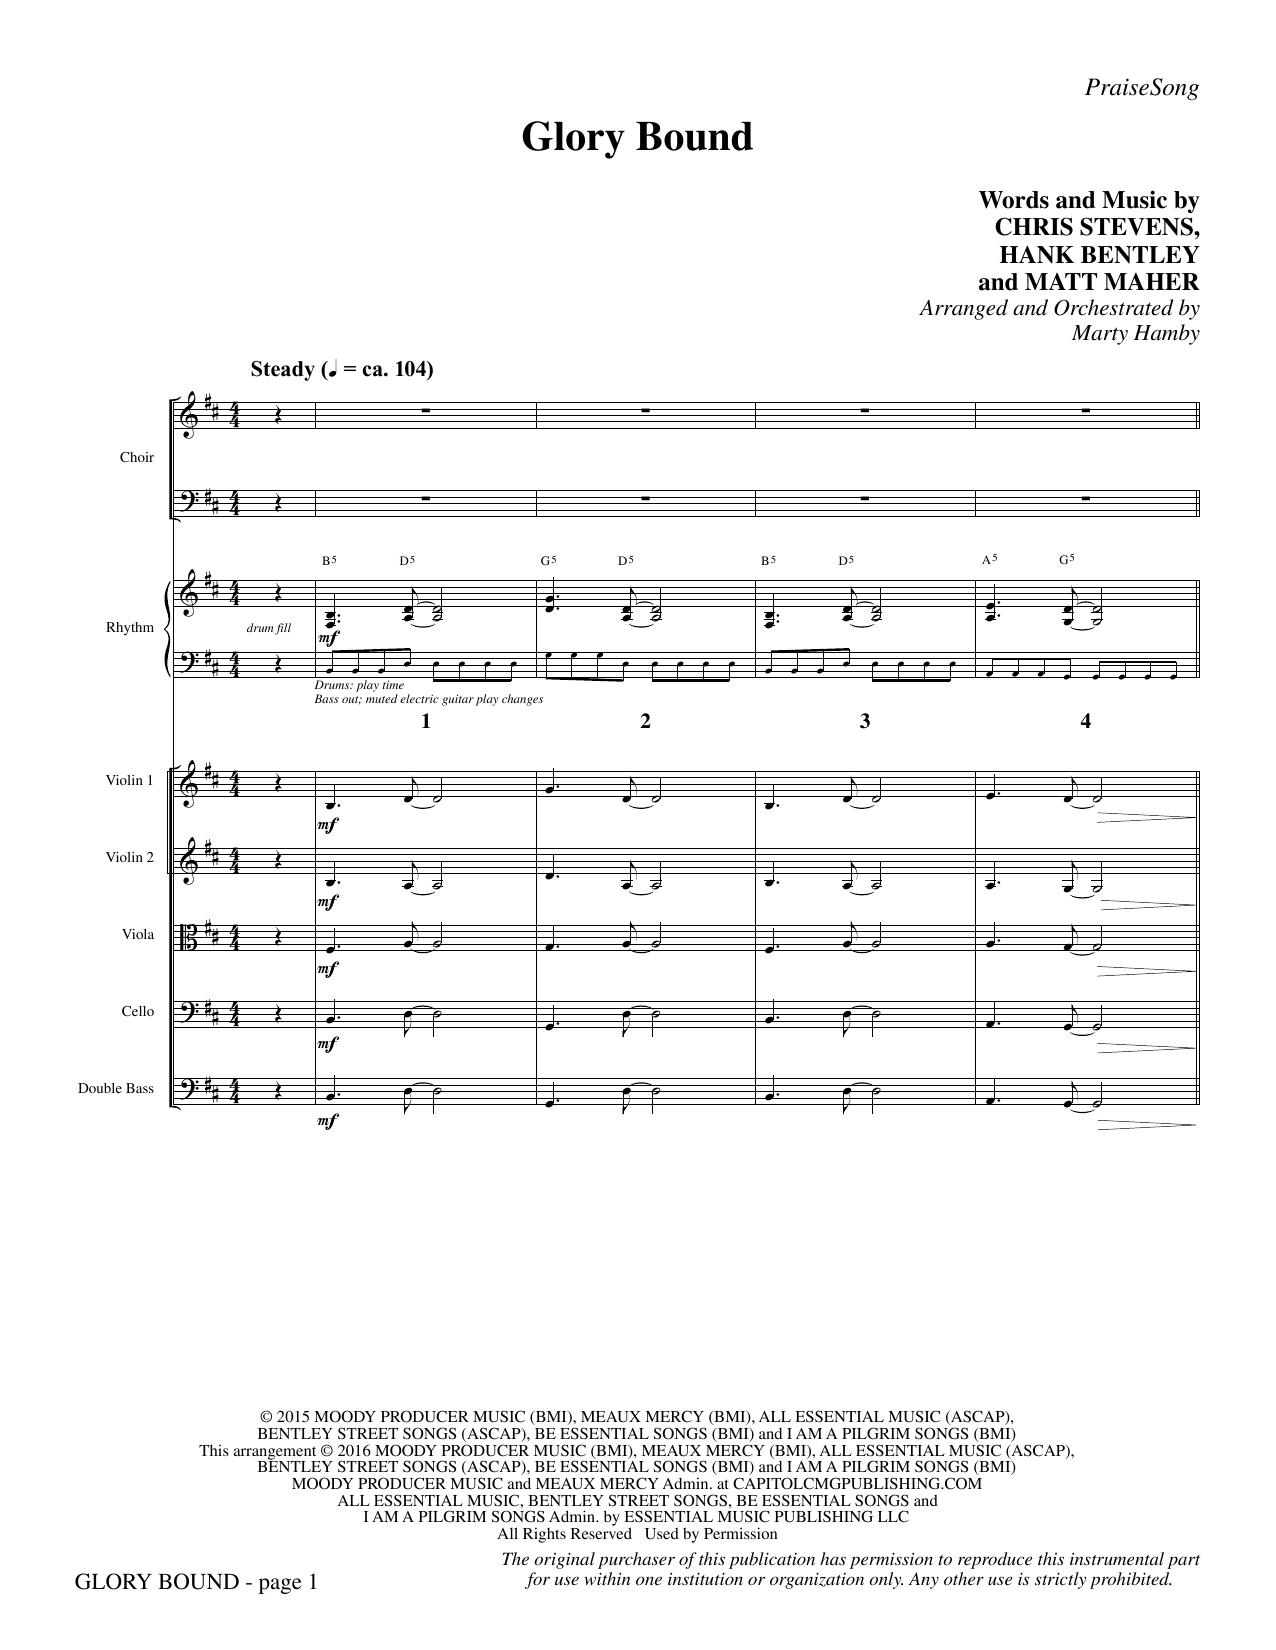 Glory Bound - Full Score Sheet Music